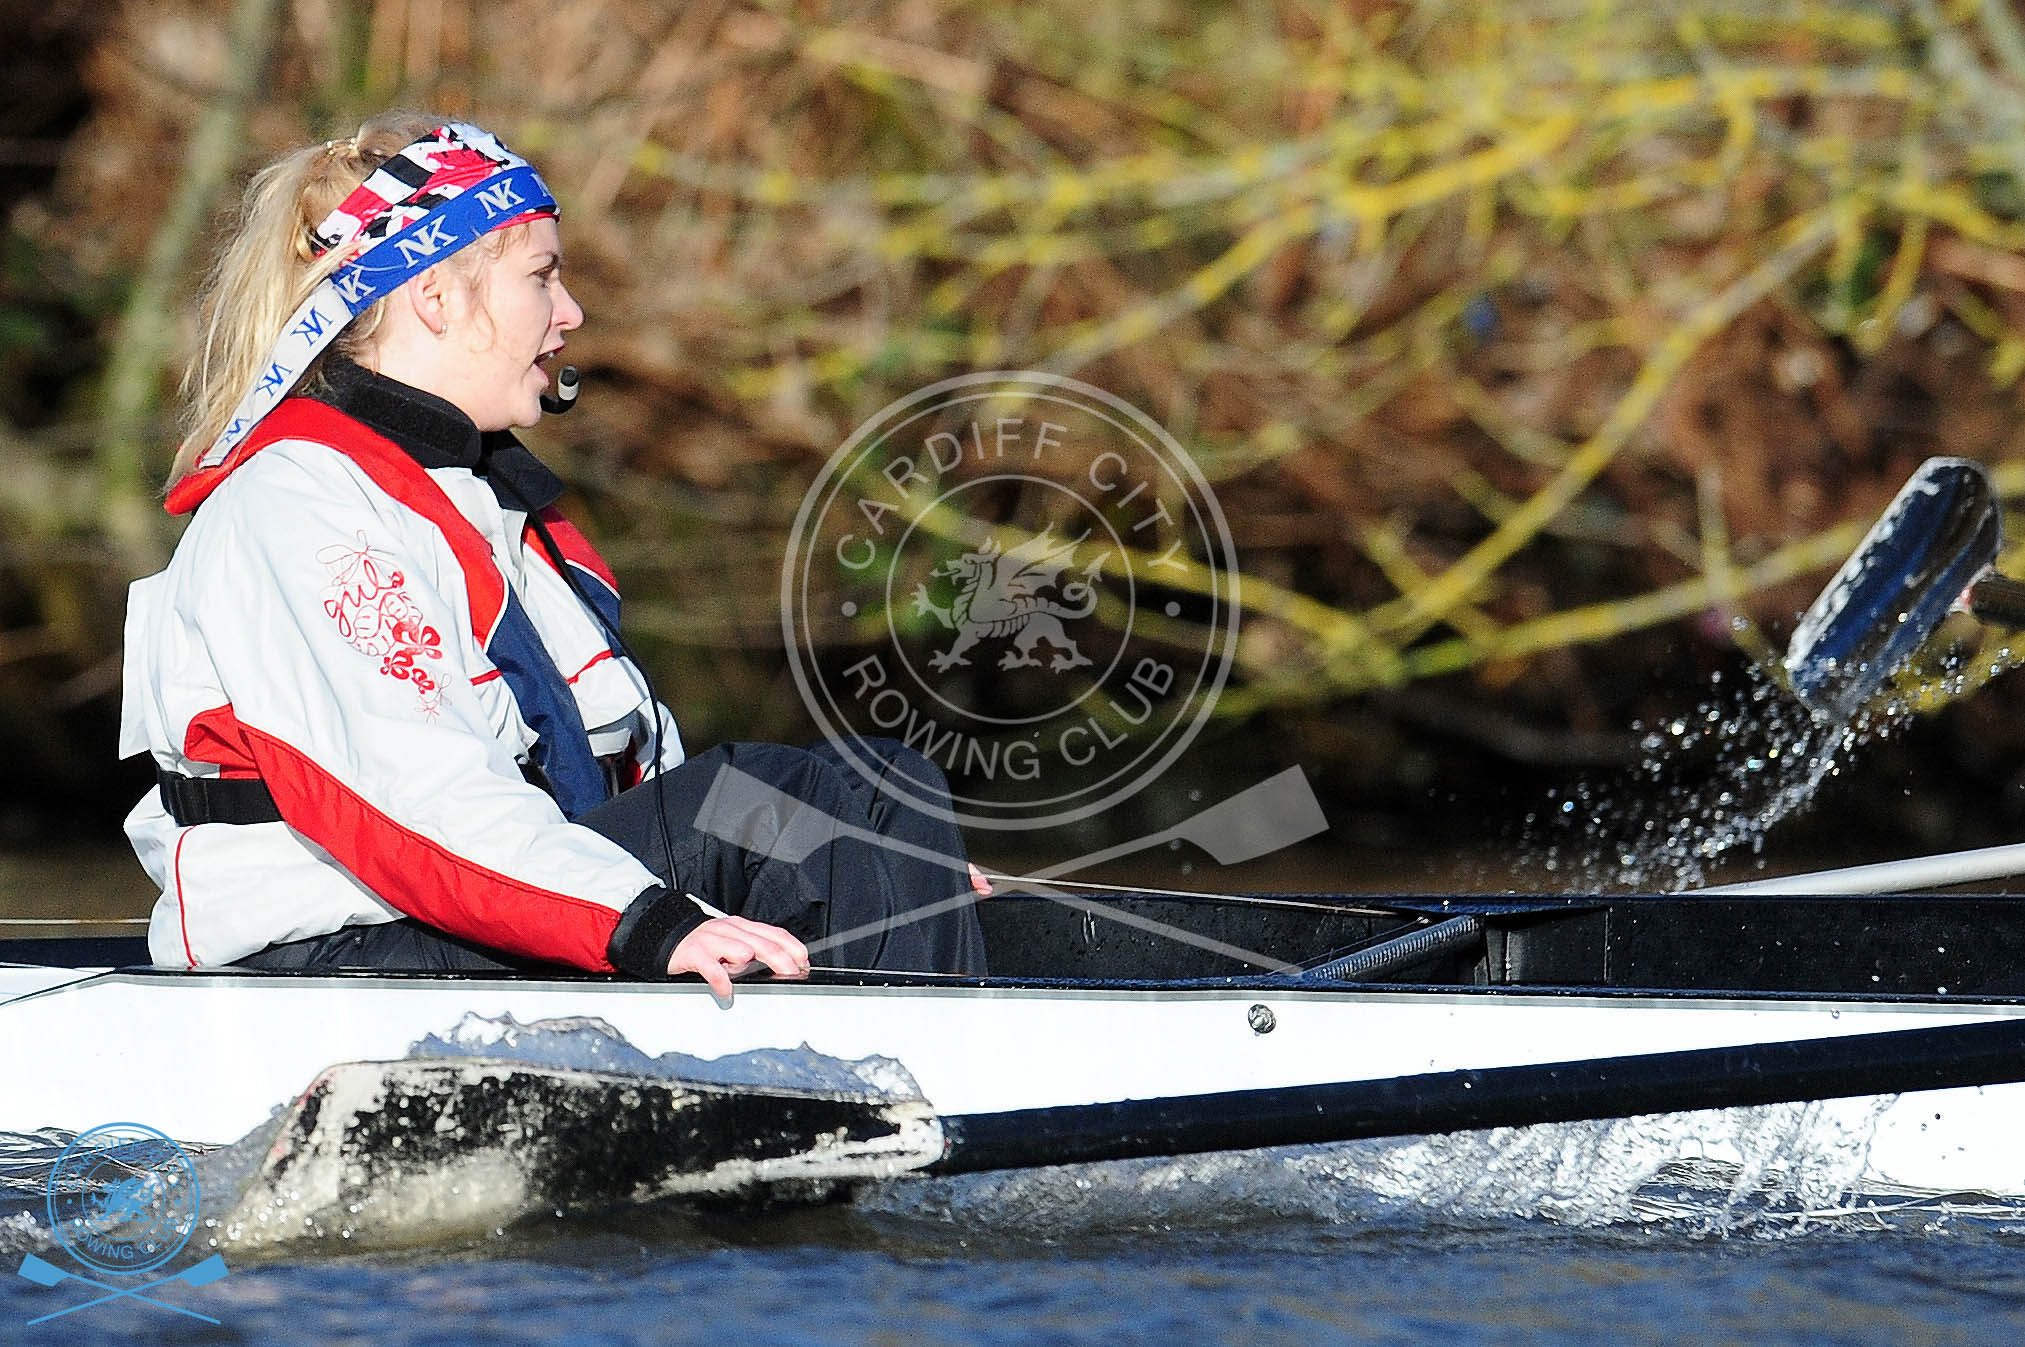 DW_280119_Cardiff_City_Rowing_247.jpg